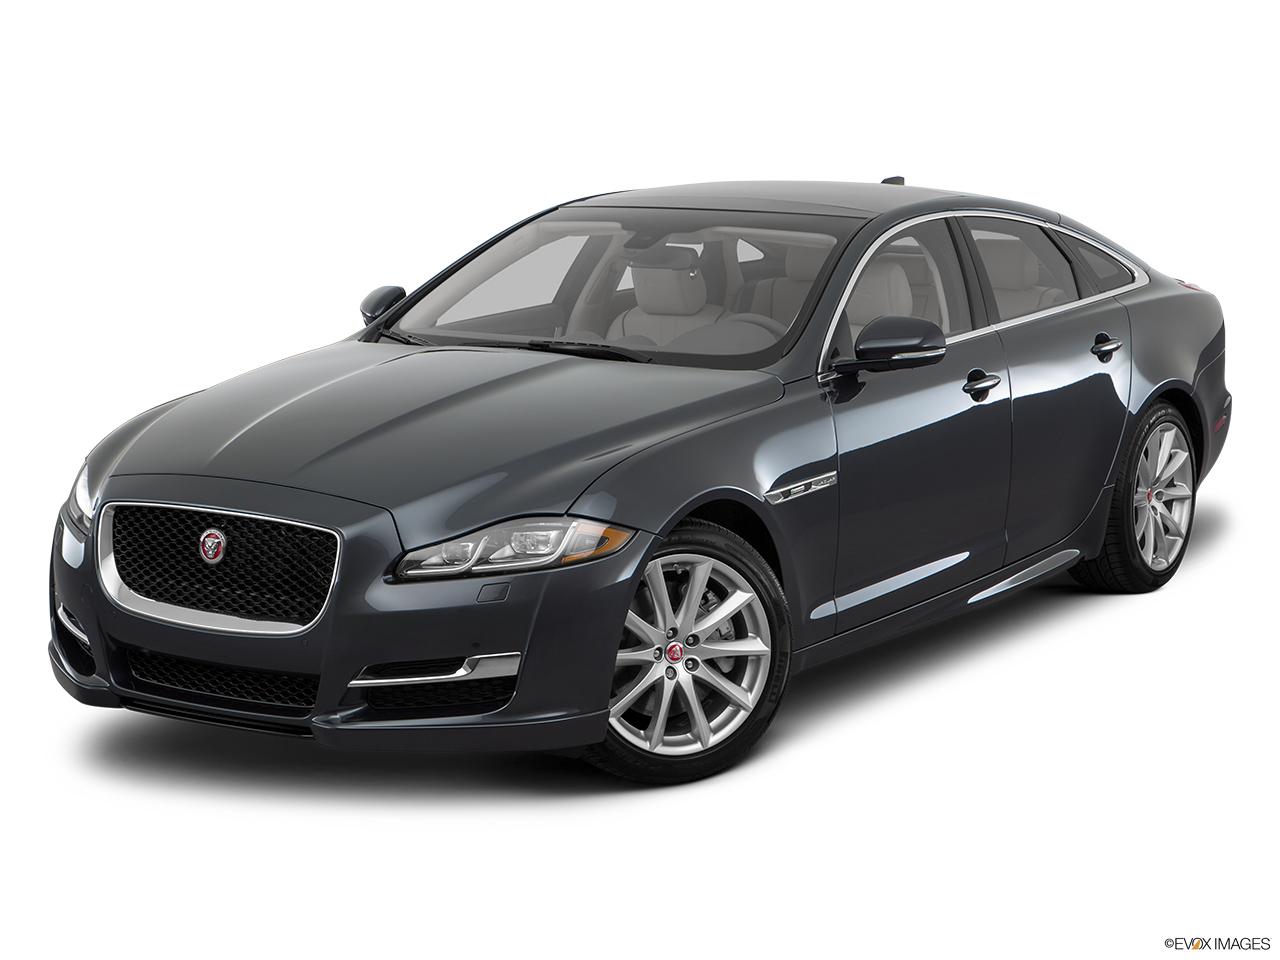 jaguar xj 2016 5 0 v8 portfolio in qatar new car prices specs reviews photos yallamotor. Black Bedroom Furniture Sets. Home Design Ideas